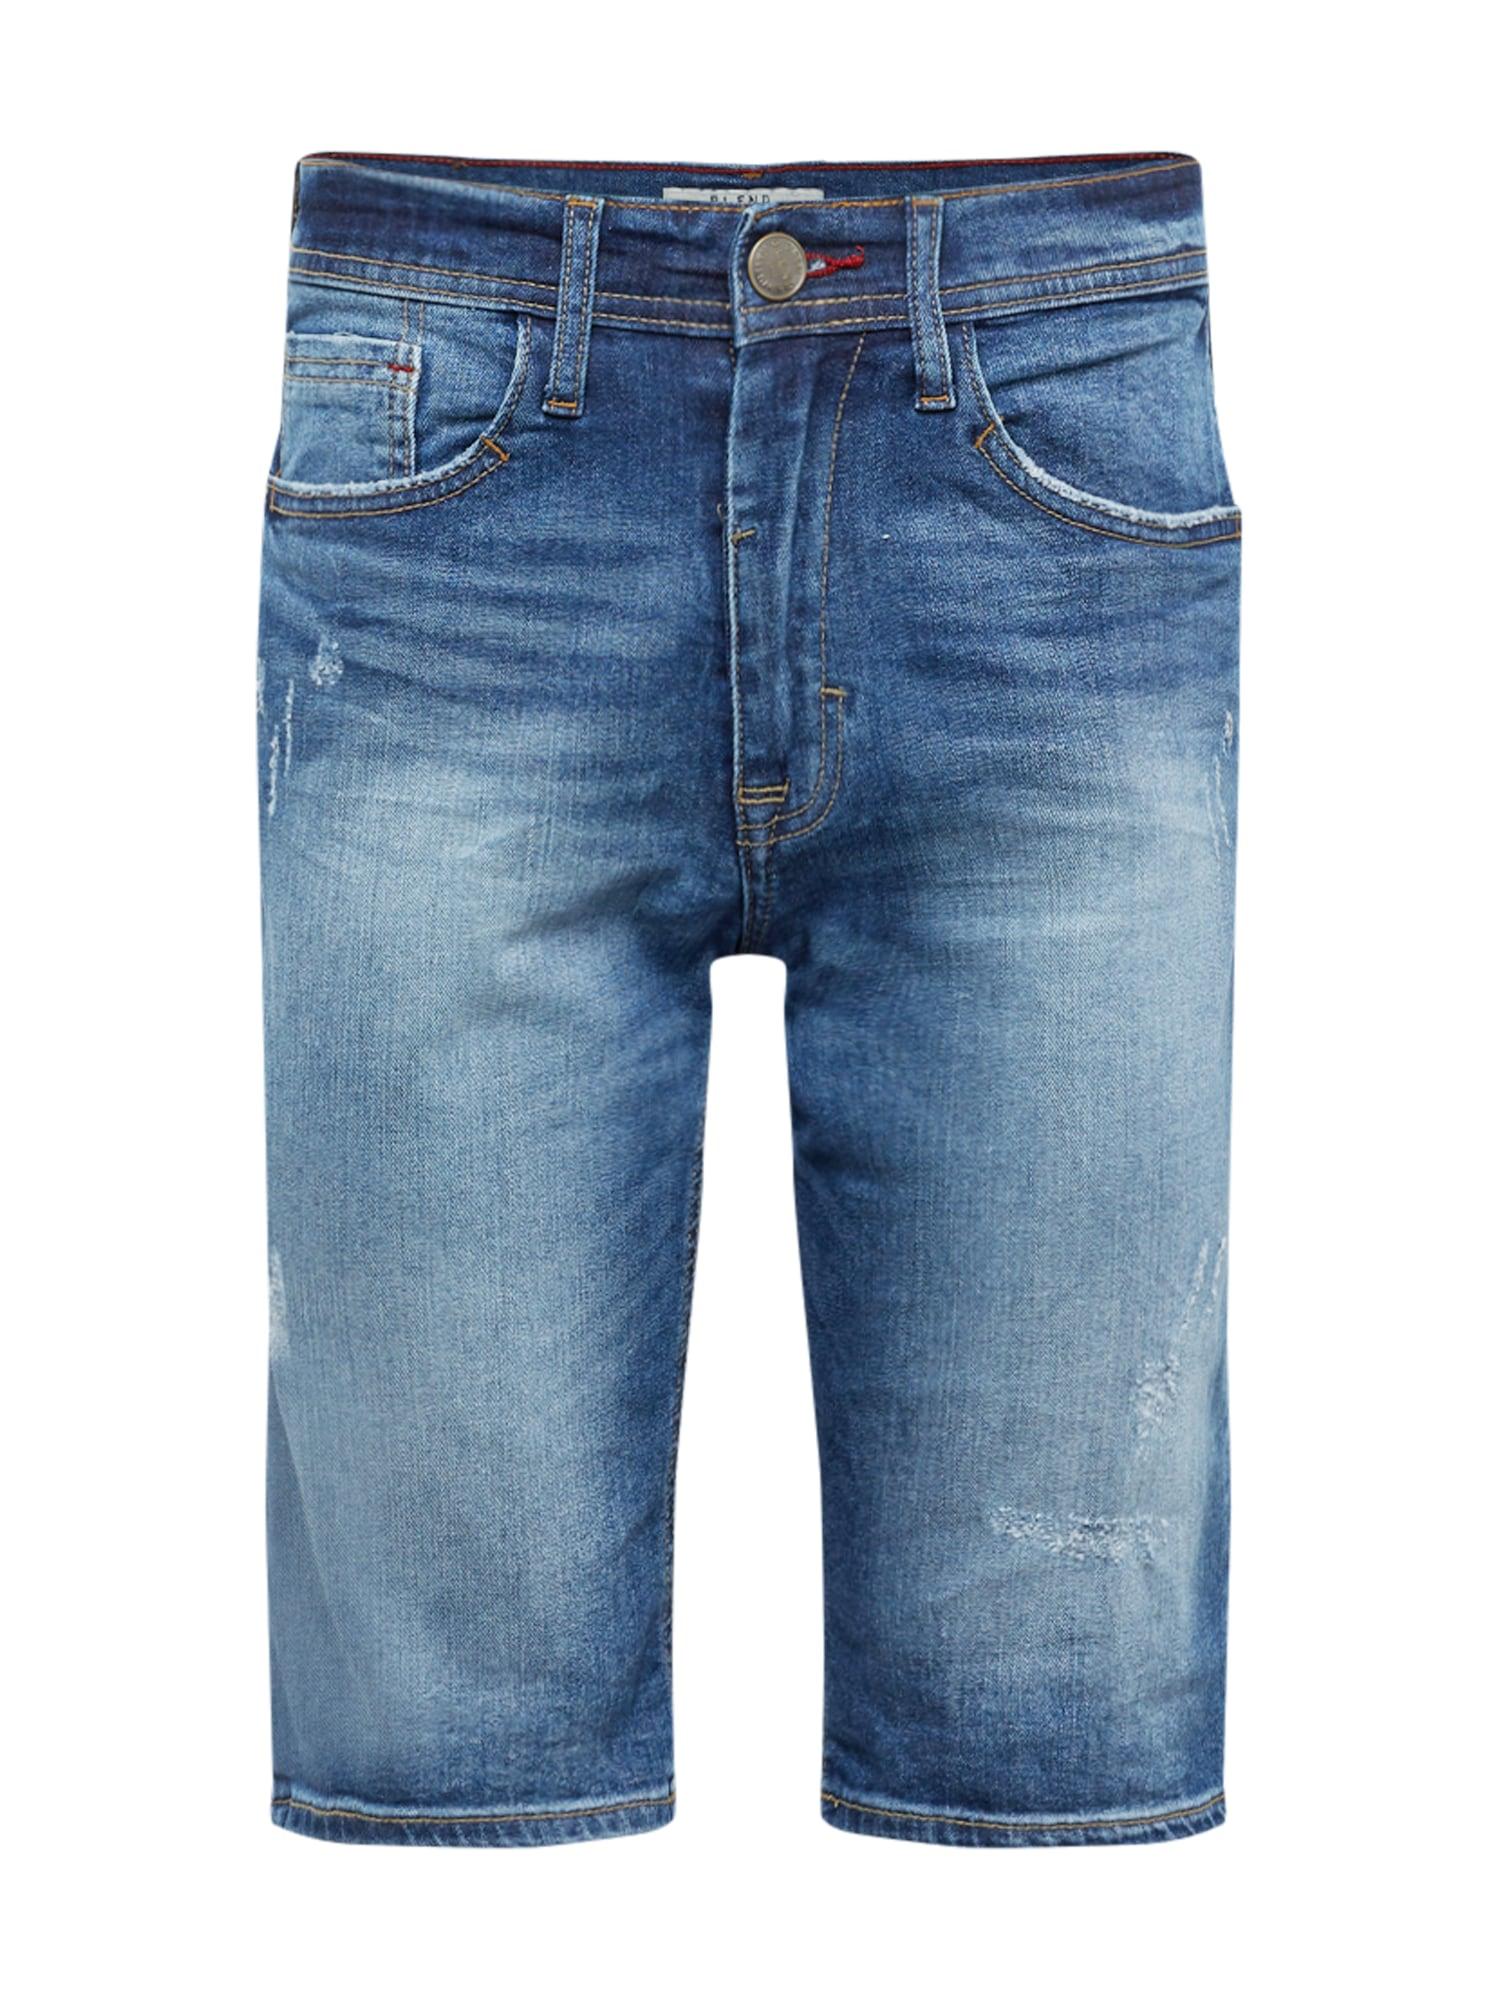 Džíny Denim Shorts Twister Slim blue denim BLEND